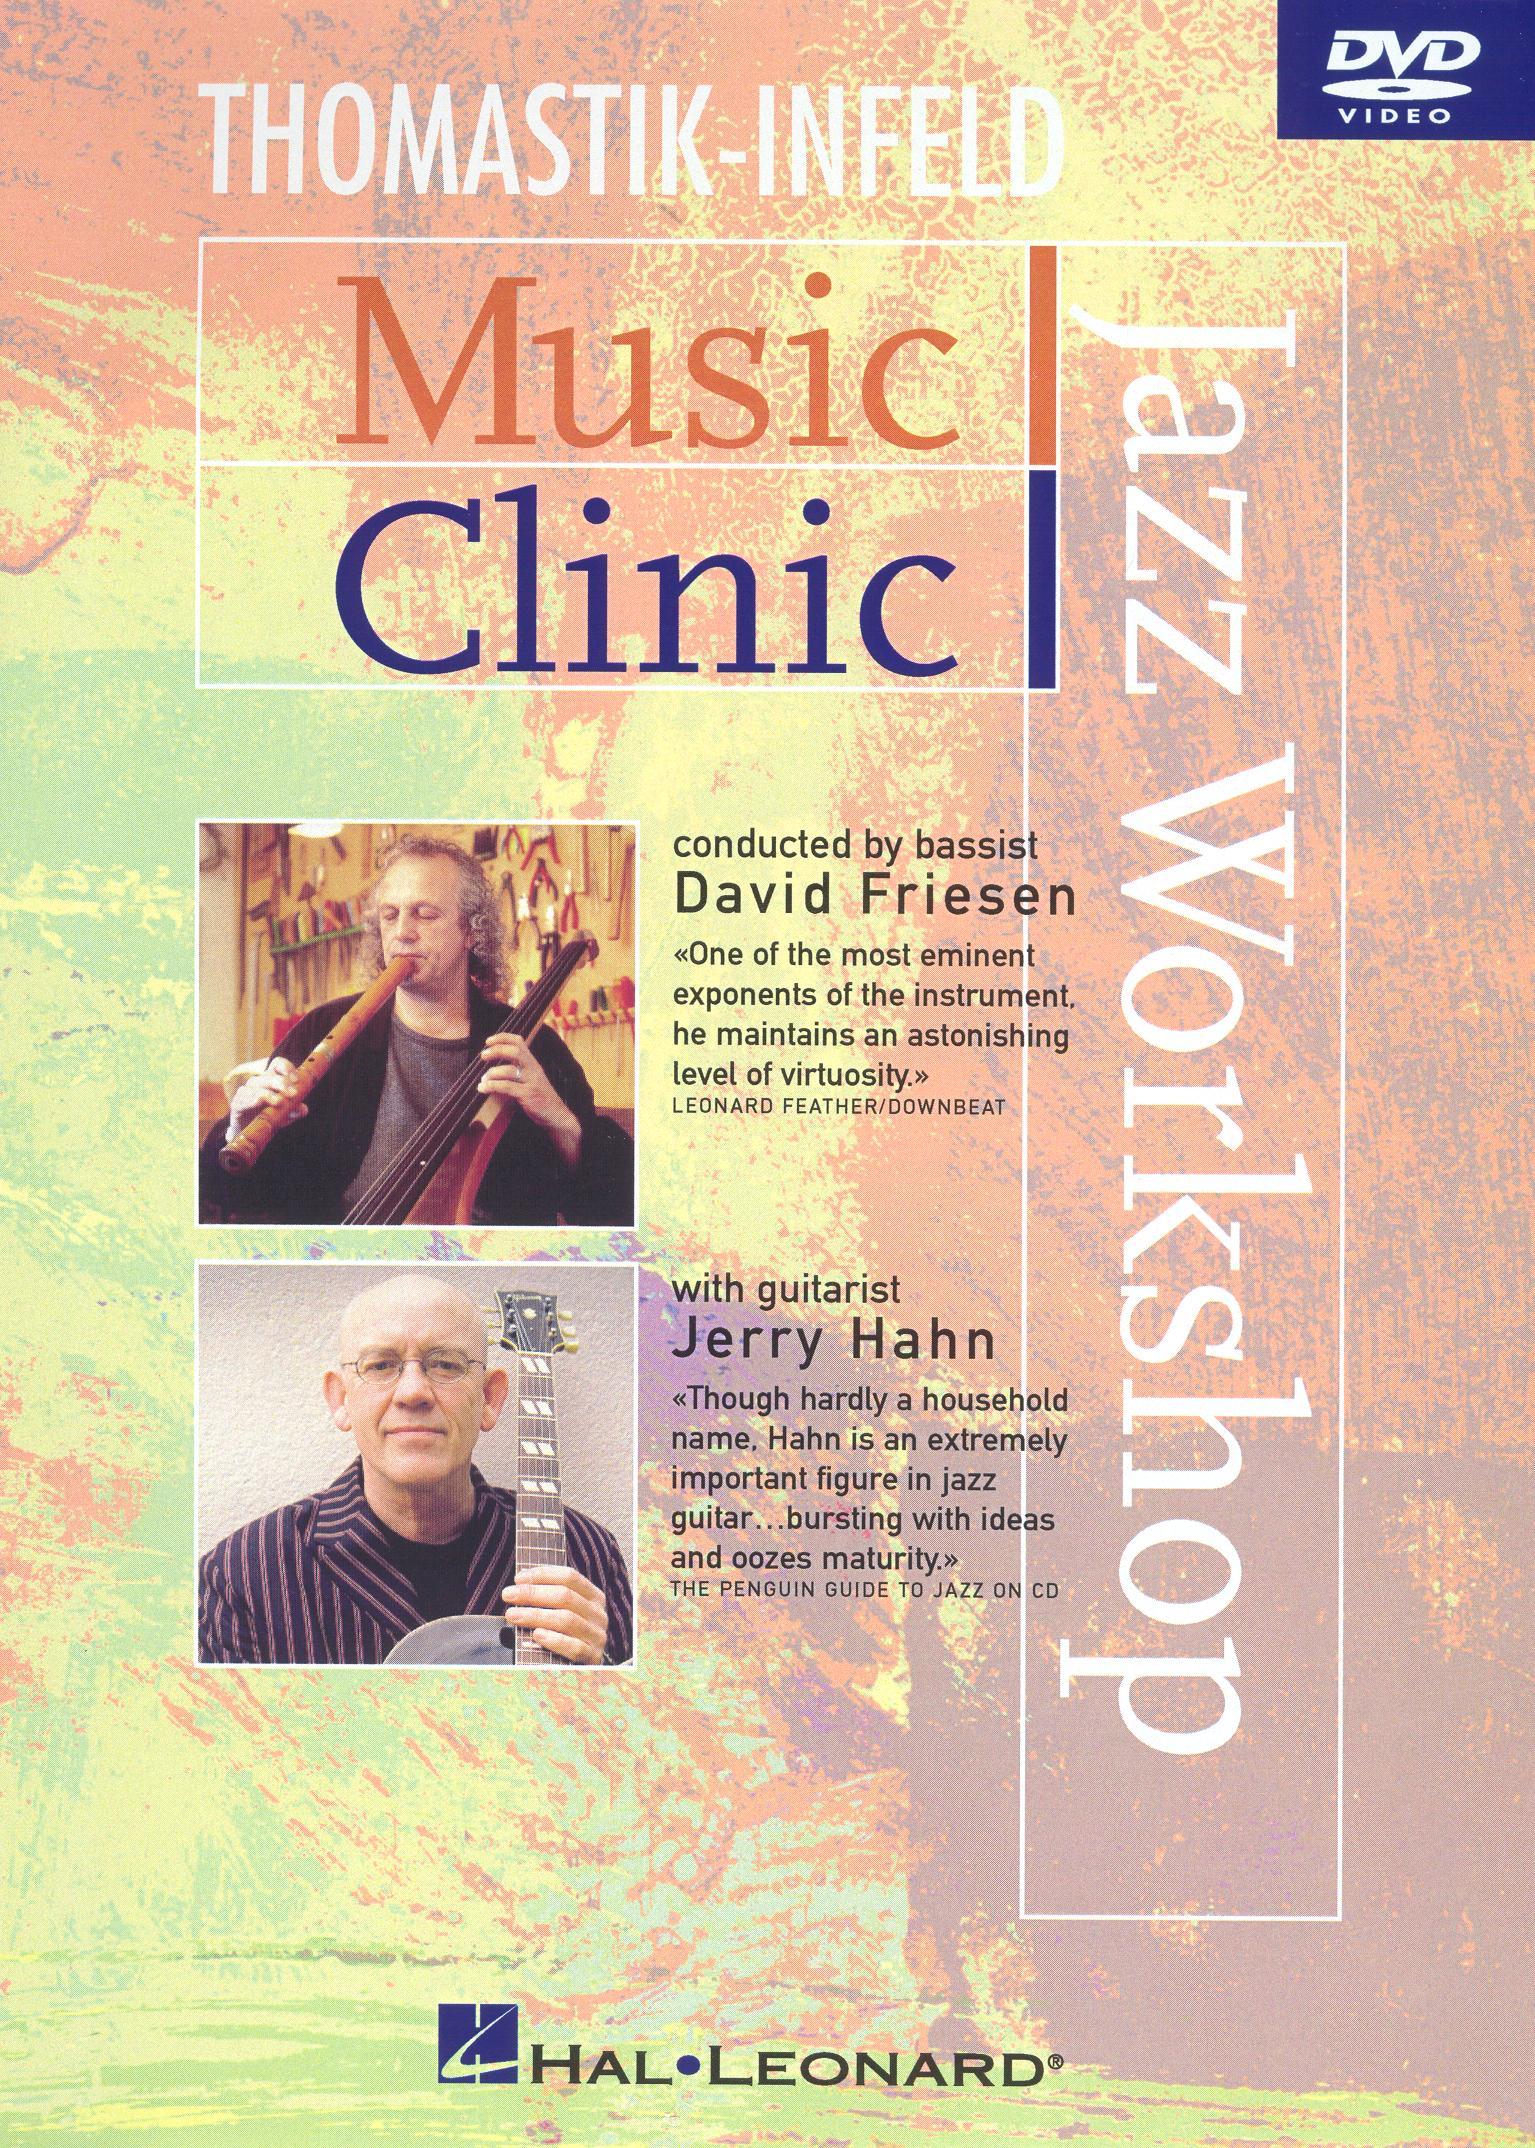 Thomastik-Inkfeld Music Clinic: Jazz Workshop